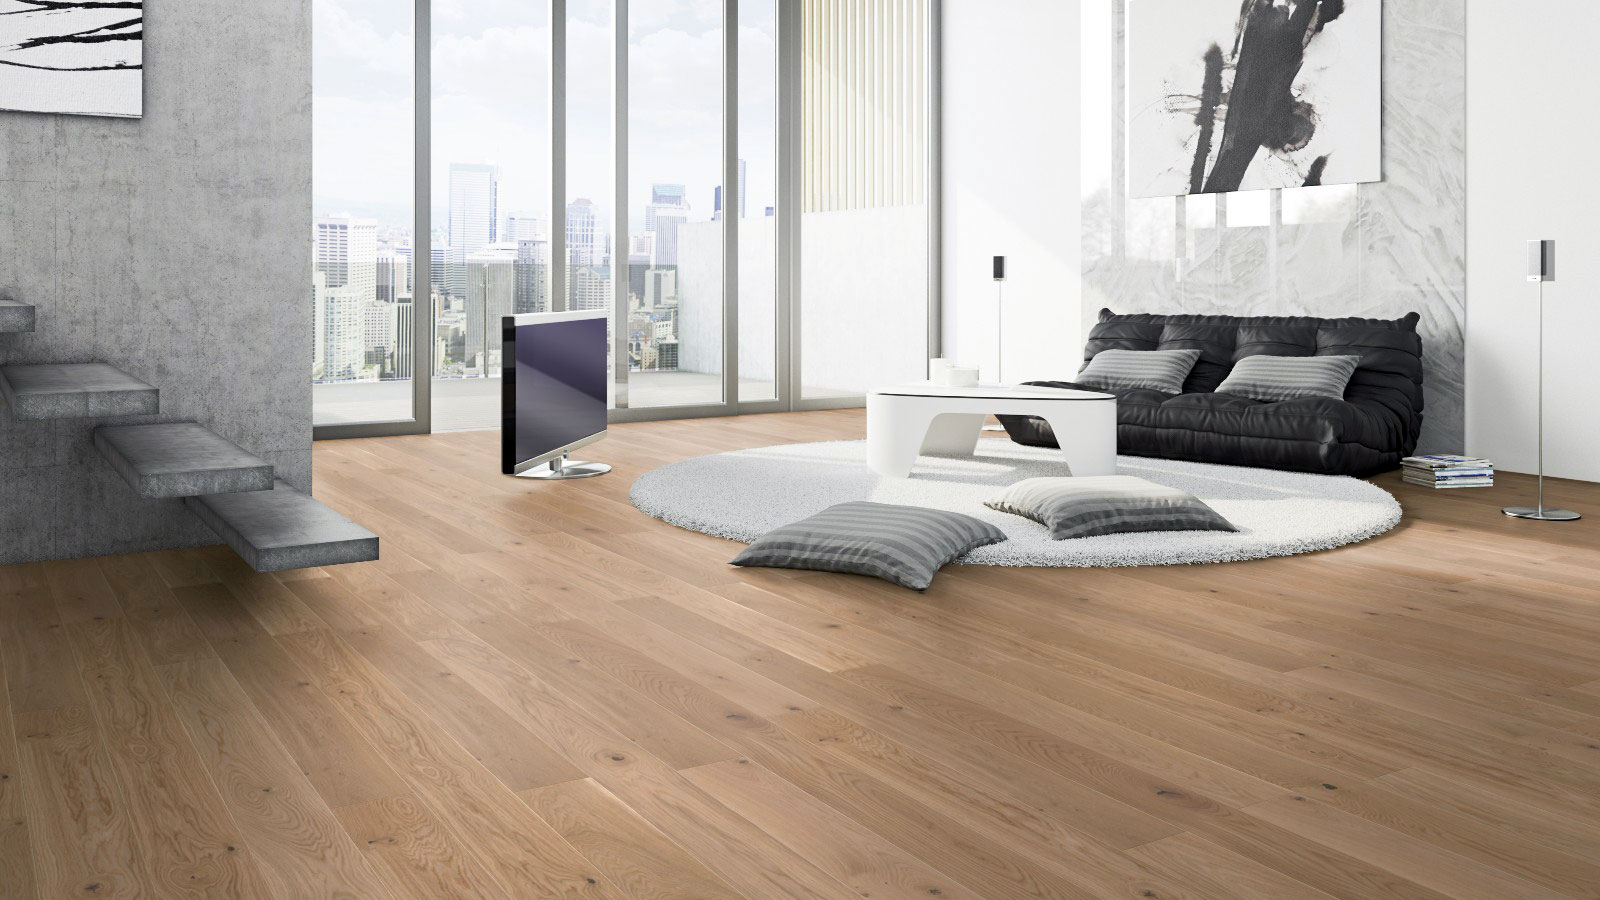 EUROHAUS European Hardwood Flooring Vancouver – German Made Floors